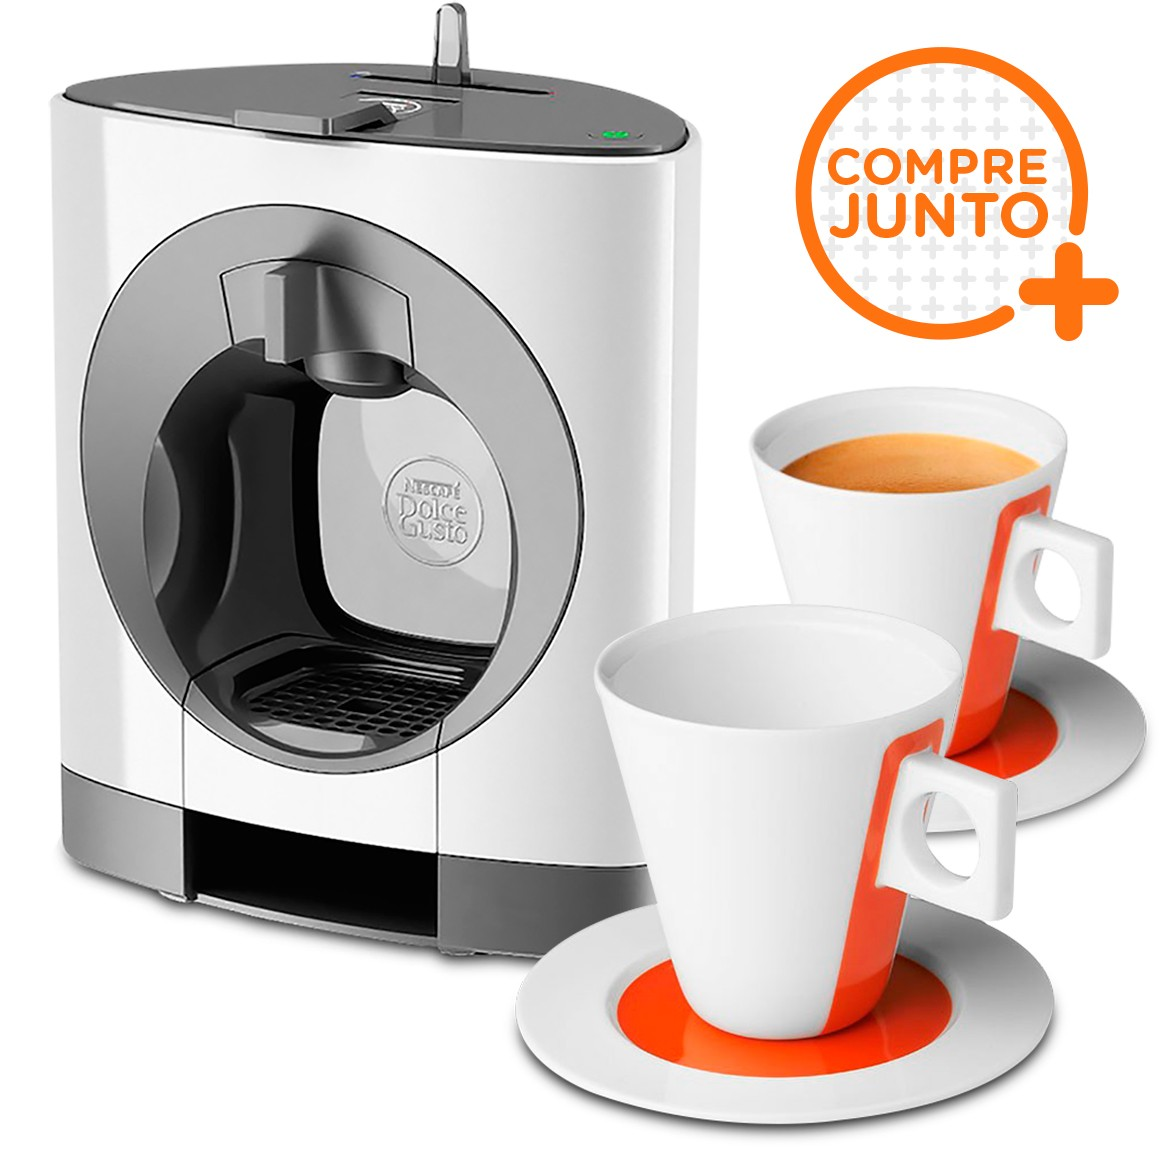 Cafeteira Expresso Dolce Gusto Oblo Branca 110v + 2 Xícaras Iconic para Lungo 160ml